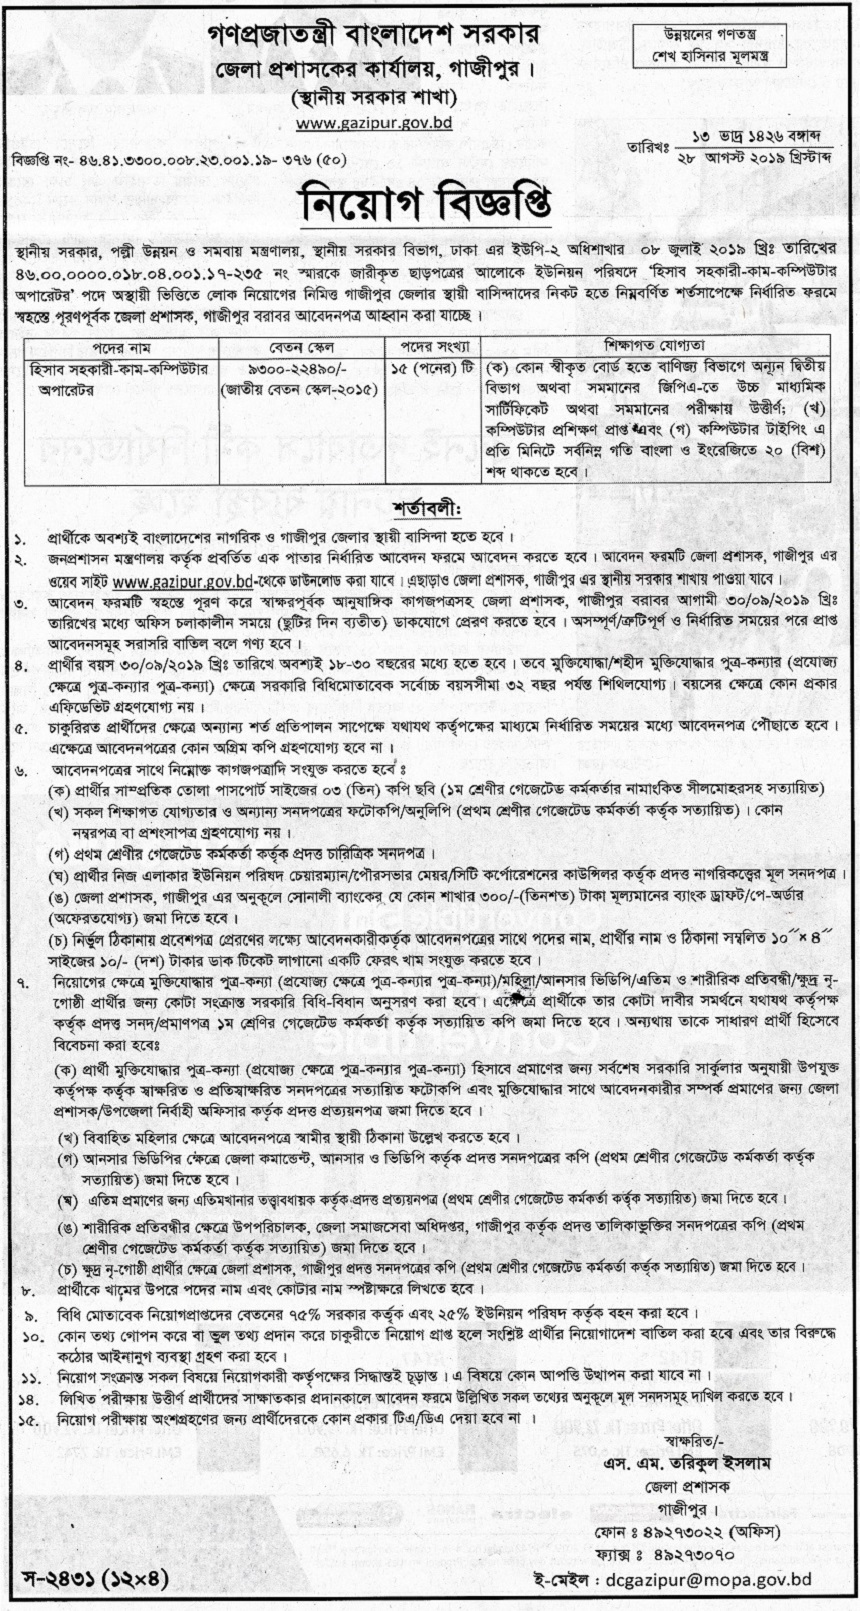 Deputy Commissioner's Office Job Circular 2019